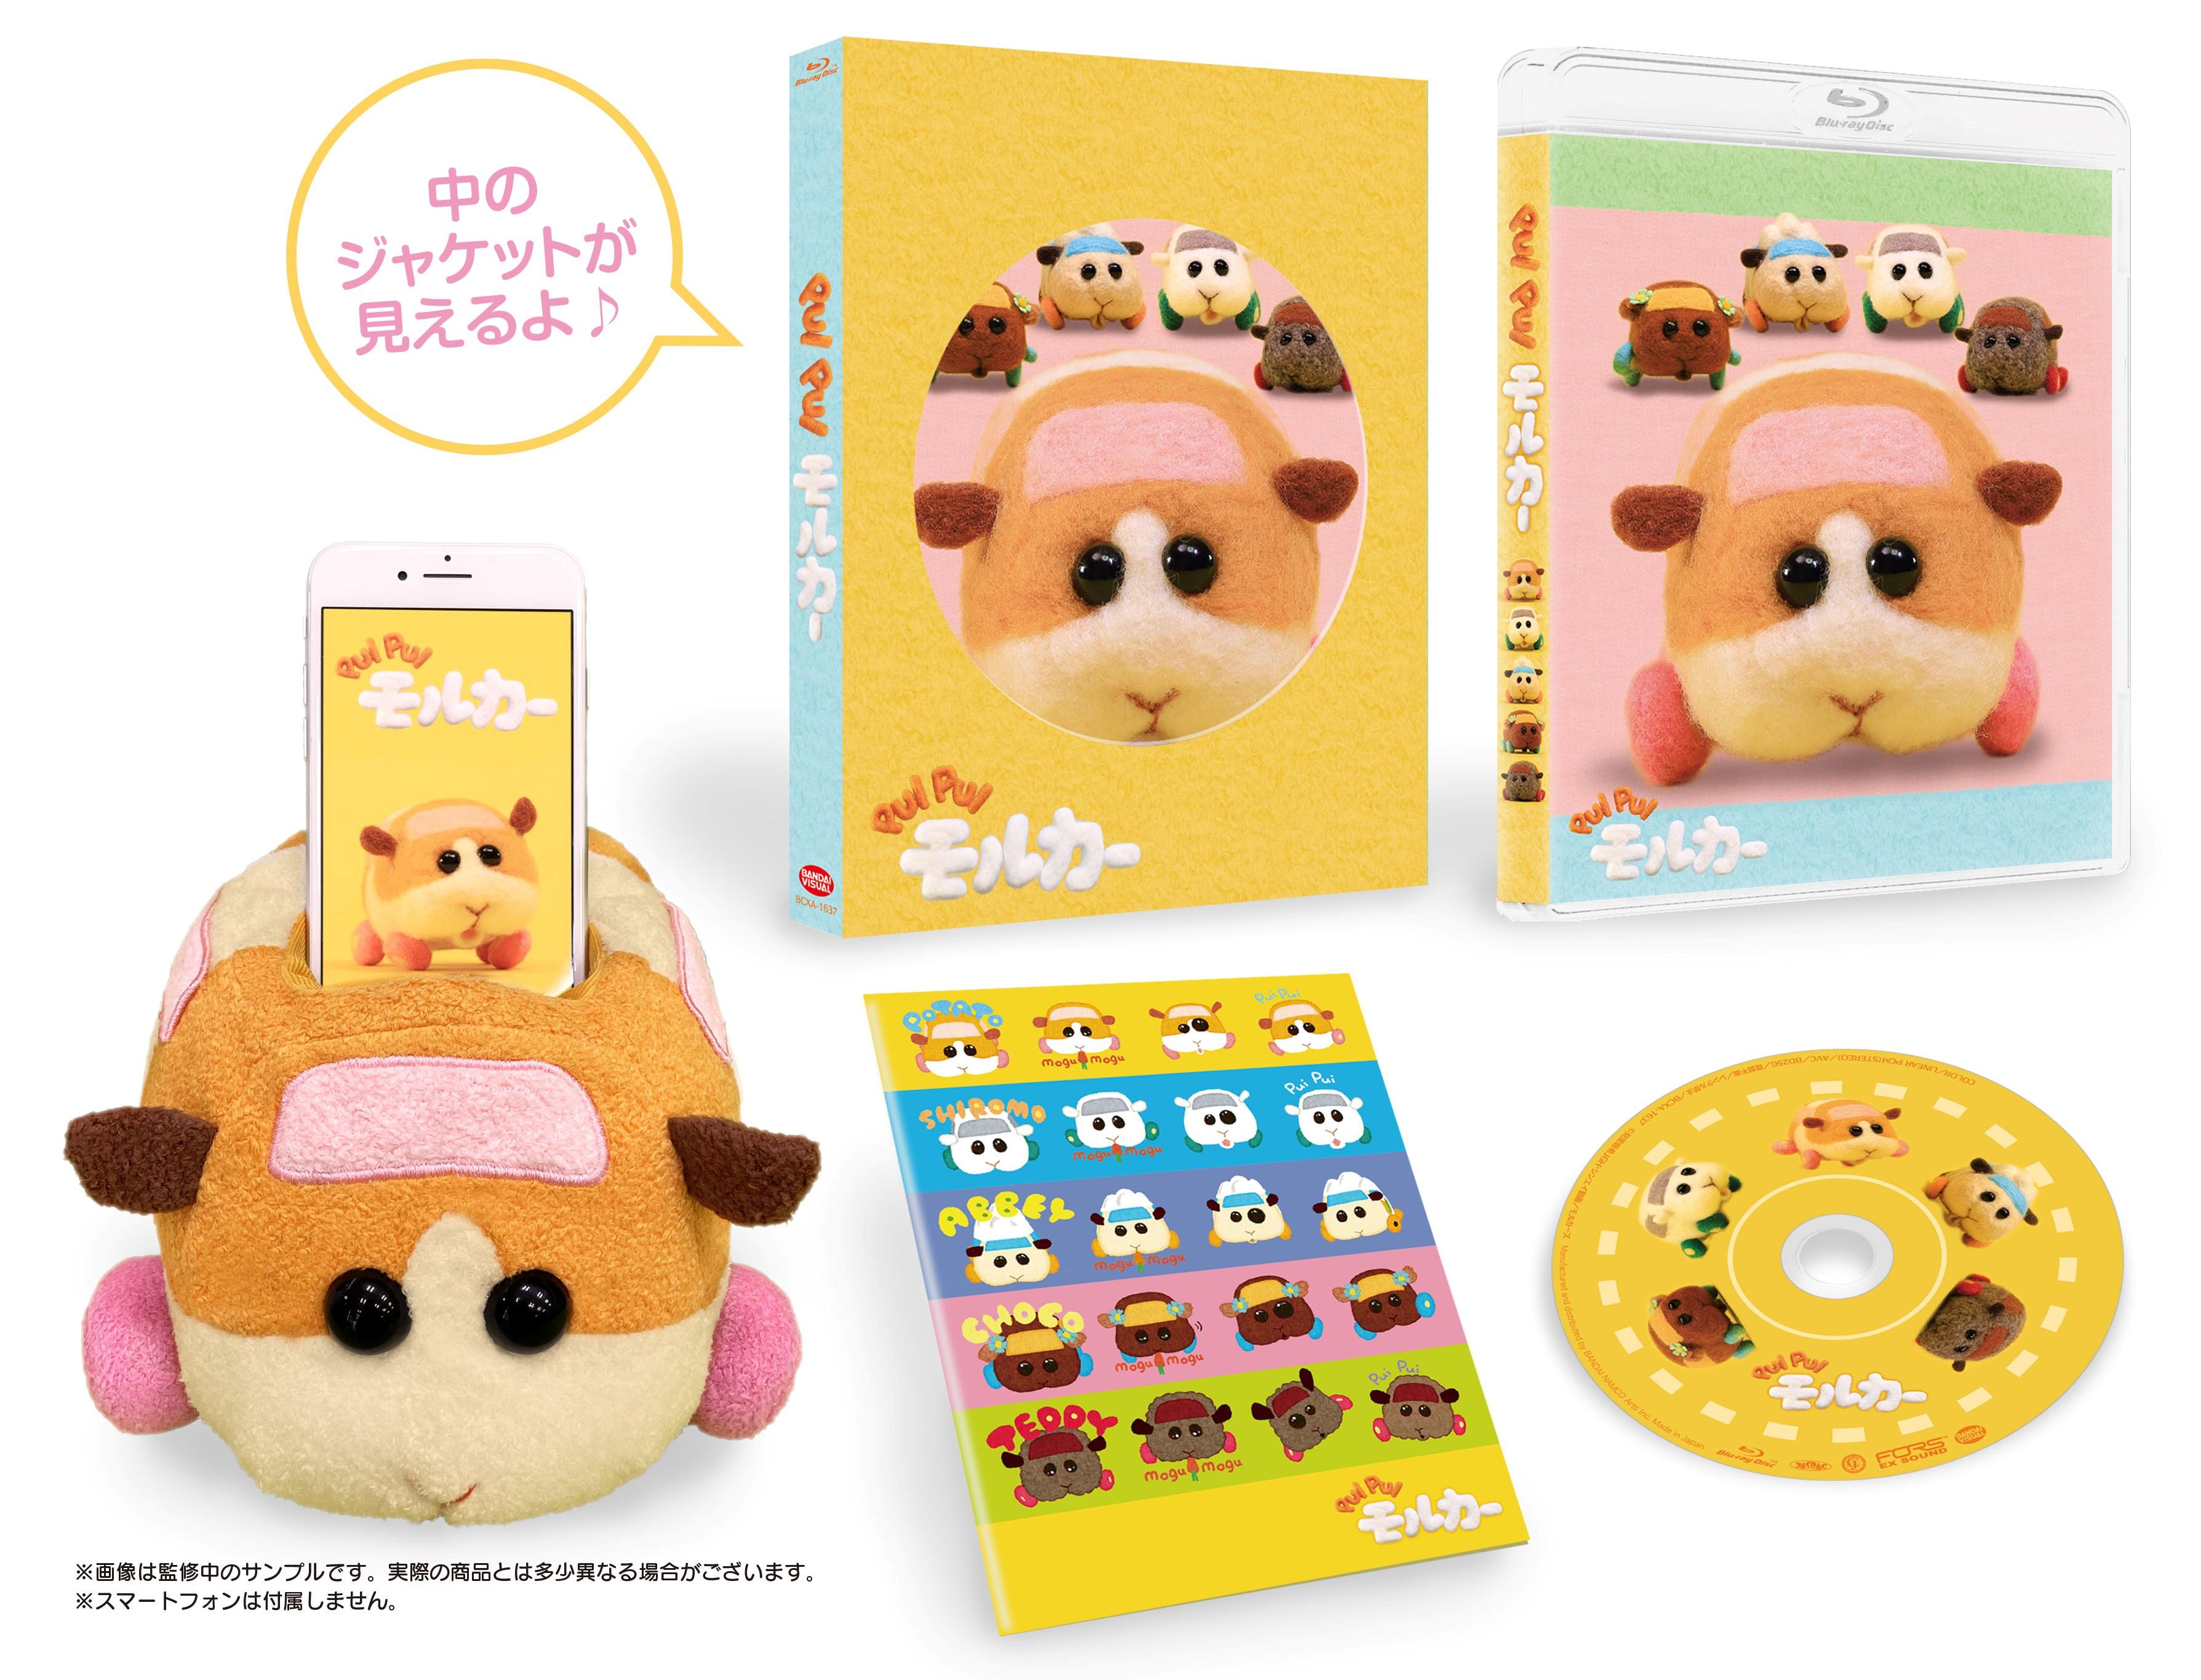 SNSで話題沸騰中!大人気TVアニメシリーズ!『PUI PUI モルカー』 Blu-ray&DVD発売決定!